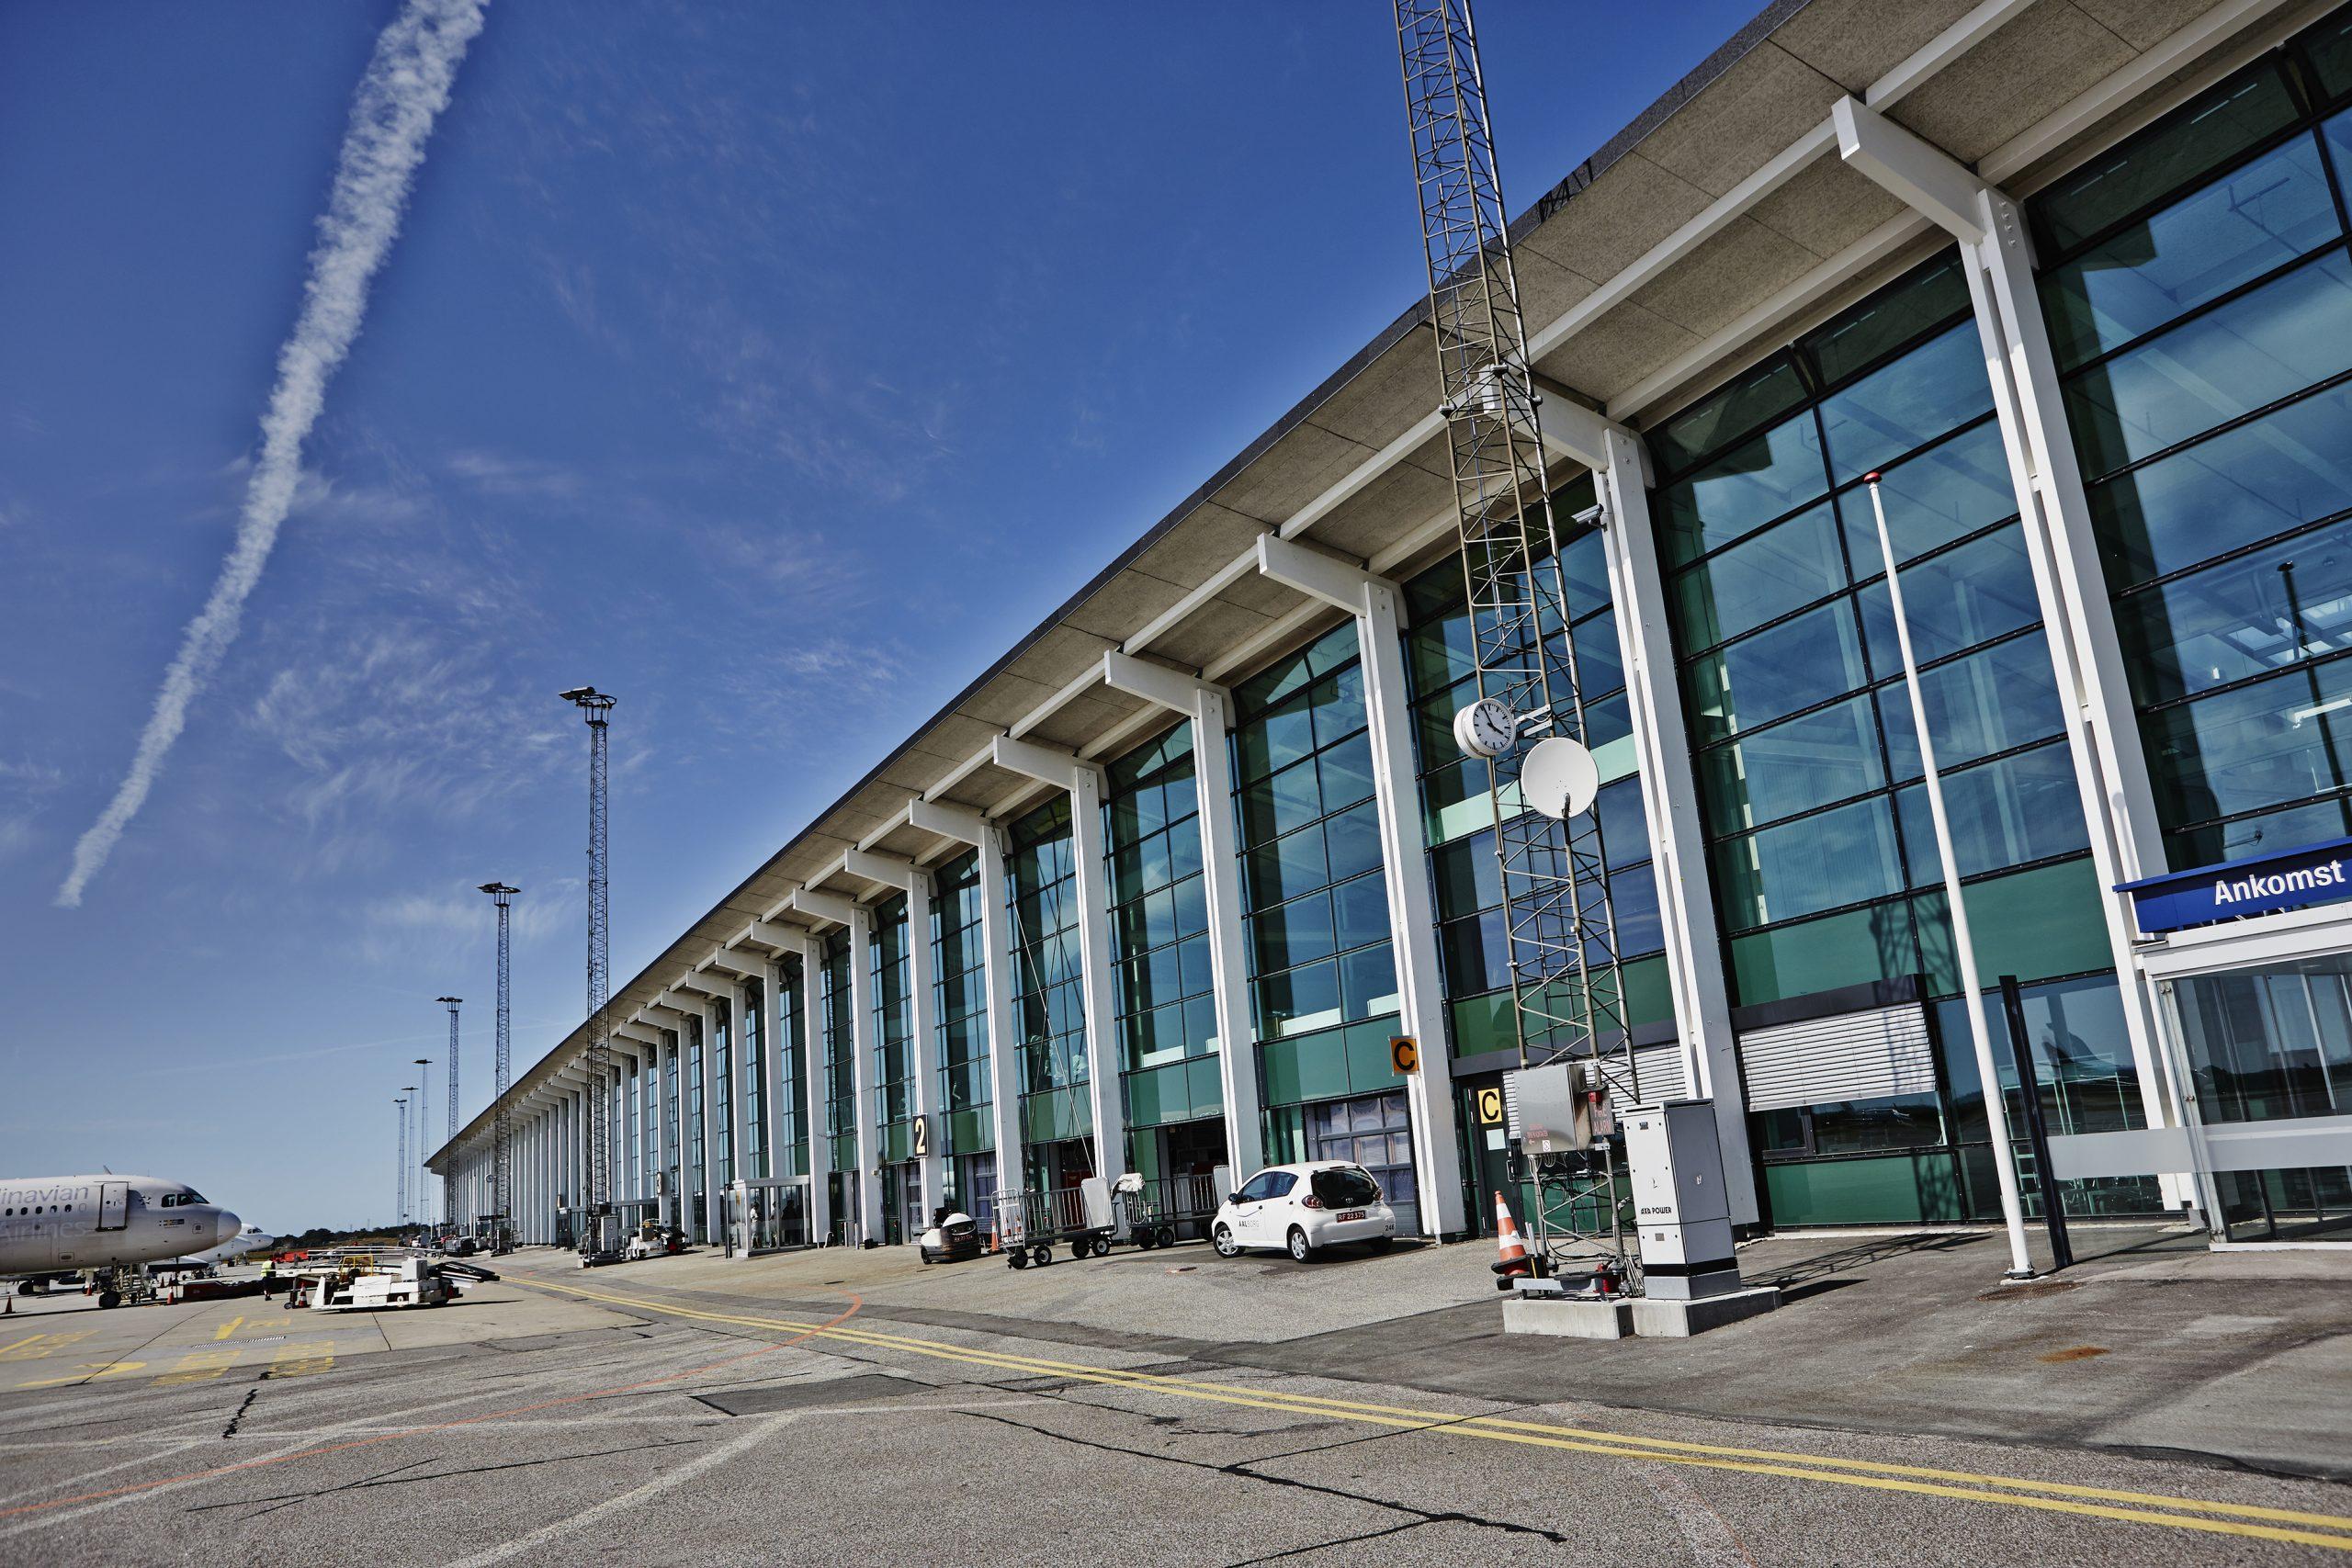 Terminalbygingen i Aalborg Lufthavn. (Foto: Aalborg Lufthavn | PR)